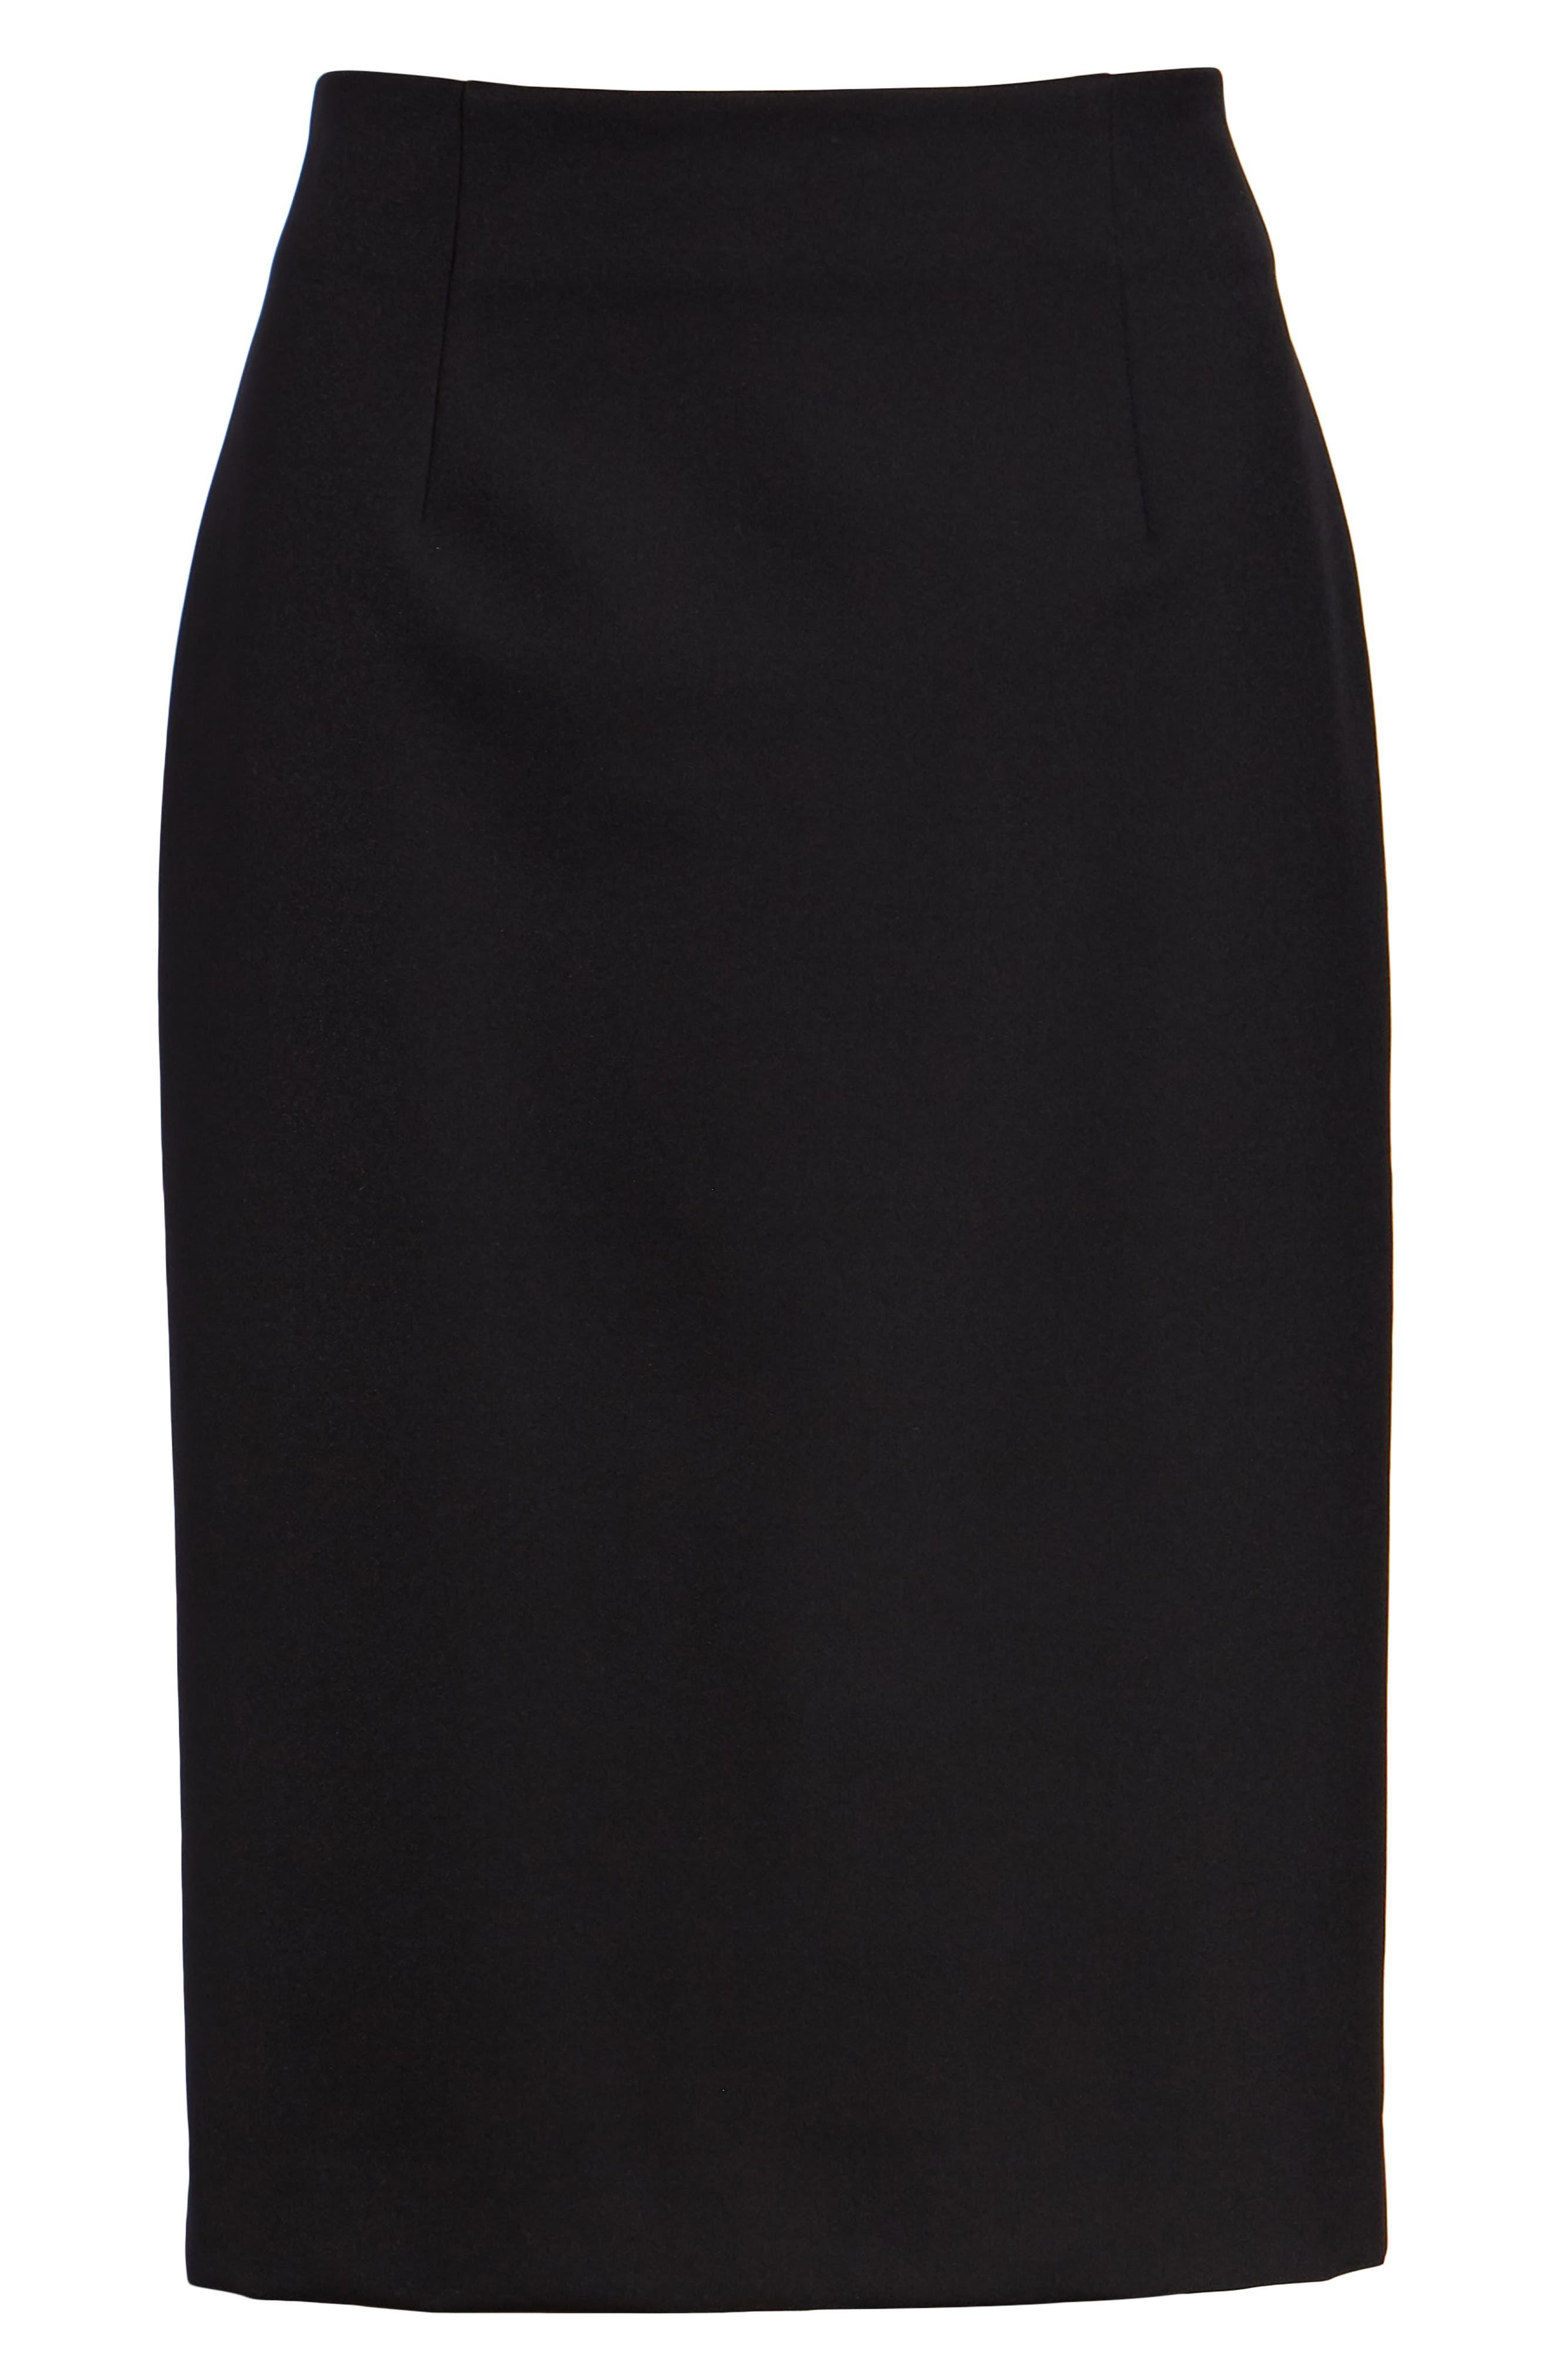 Pencil Skirt,                             Alternate thumbnail 7, color,                             BLACK